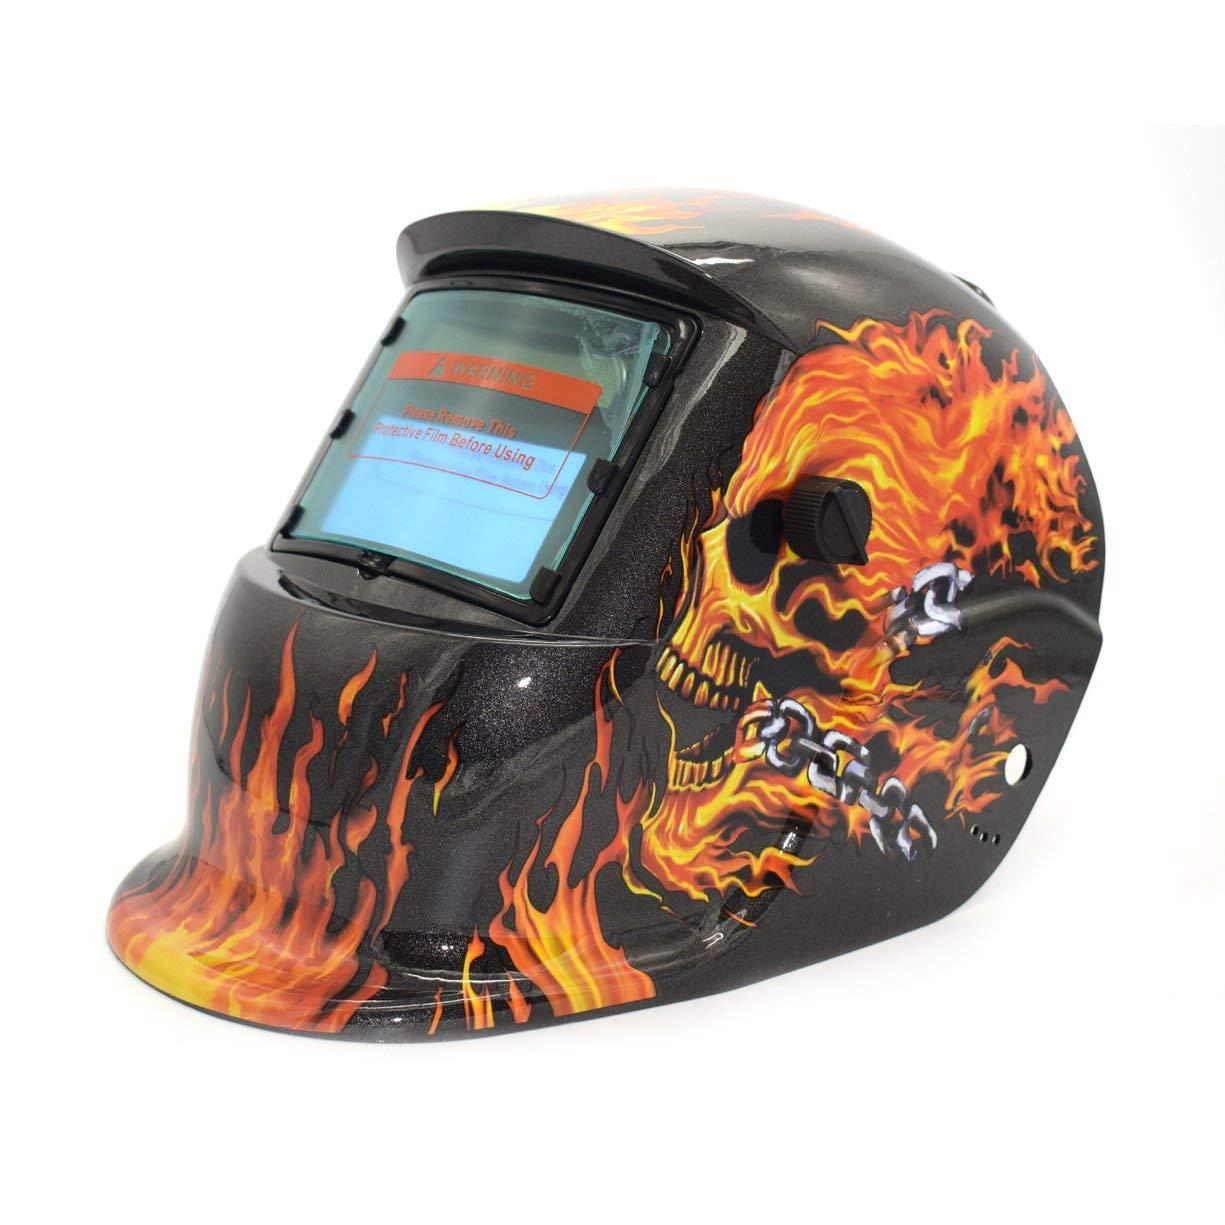 Welding Mask, Solar Powered Auto Darkening TIG MIG MMA Electric Welding Mask Helmet Welder Cap Lens For Welding Machine Plasma Cutter